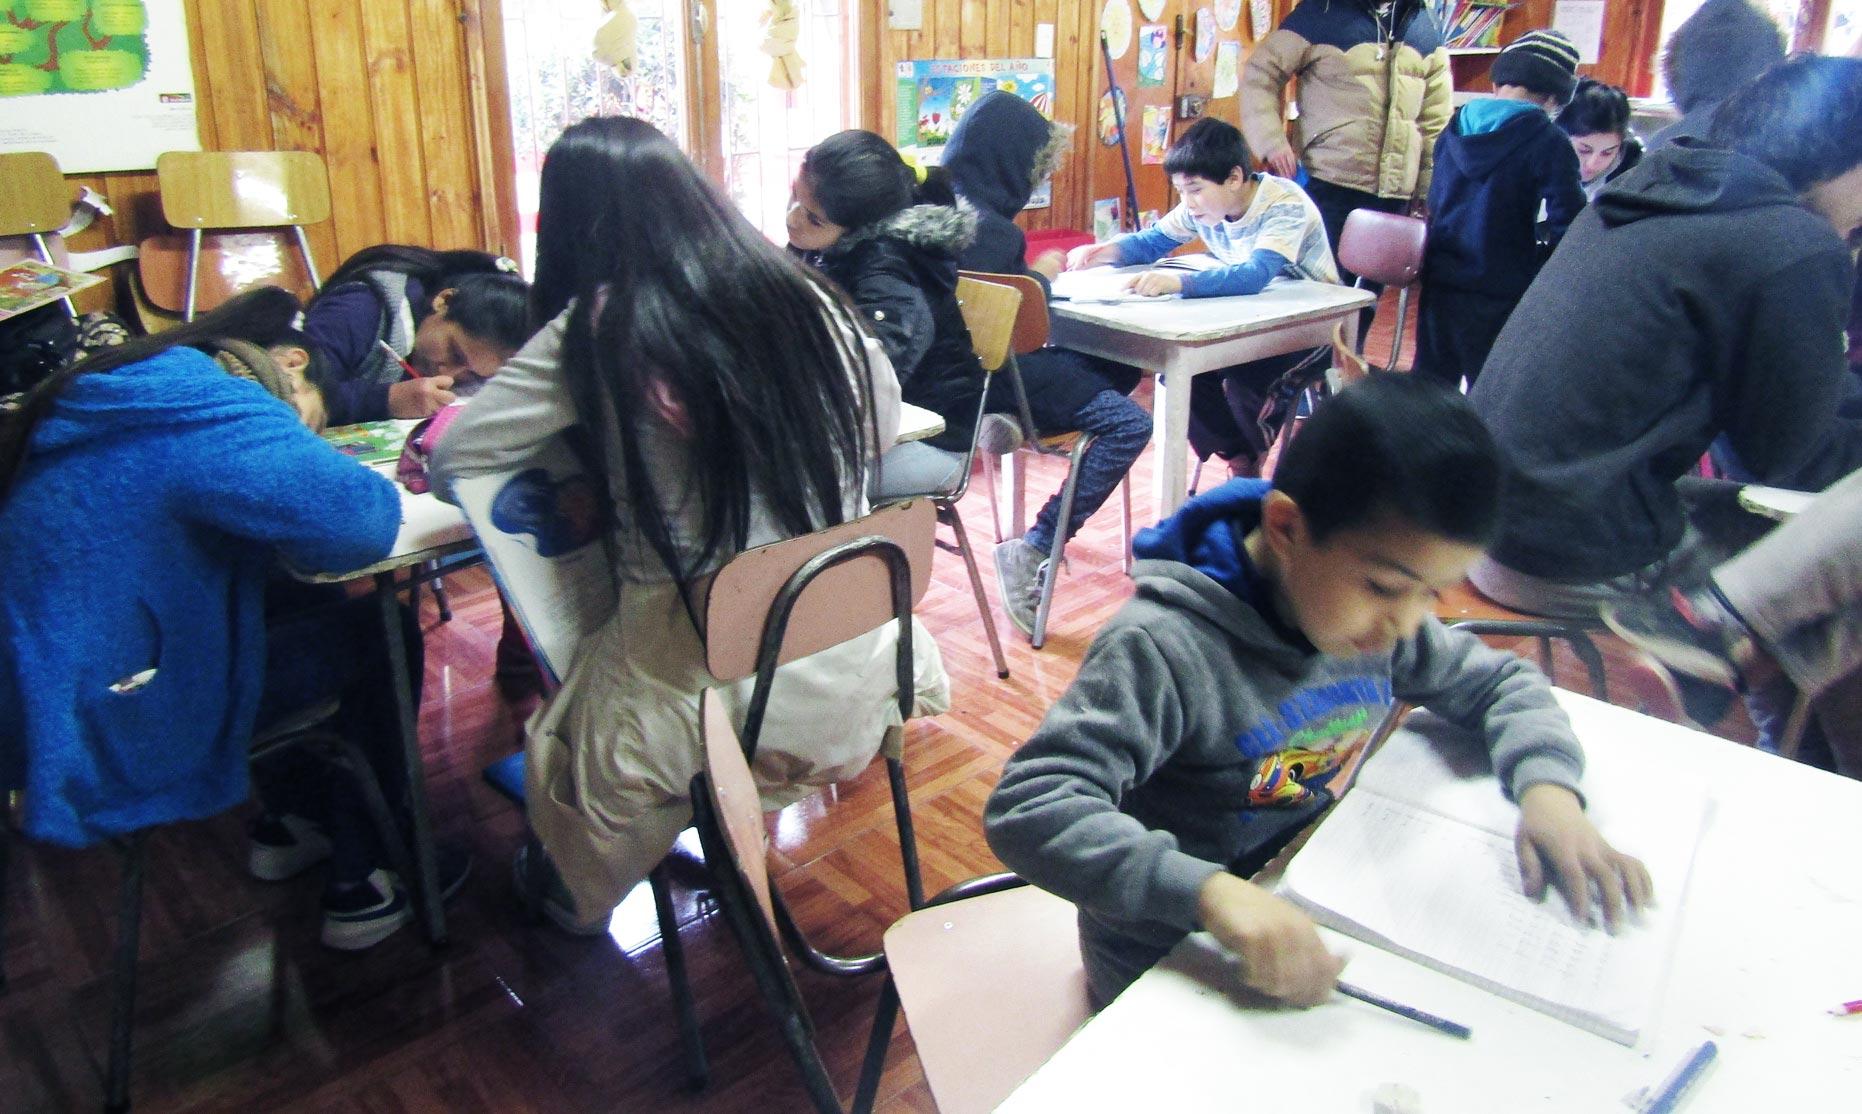 A busy day in the classroom at Centro Abierto Santa Adriana